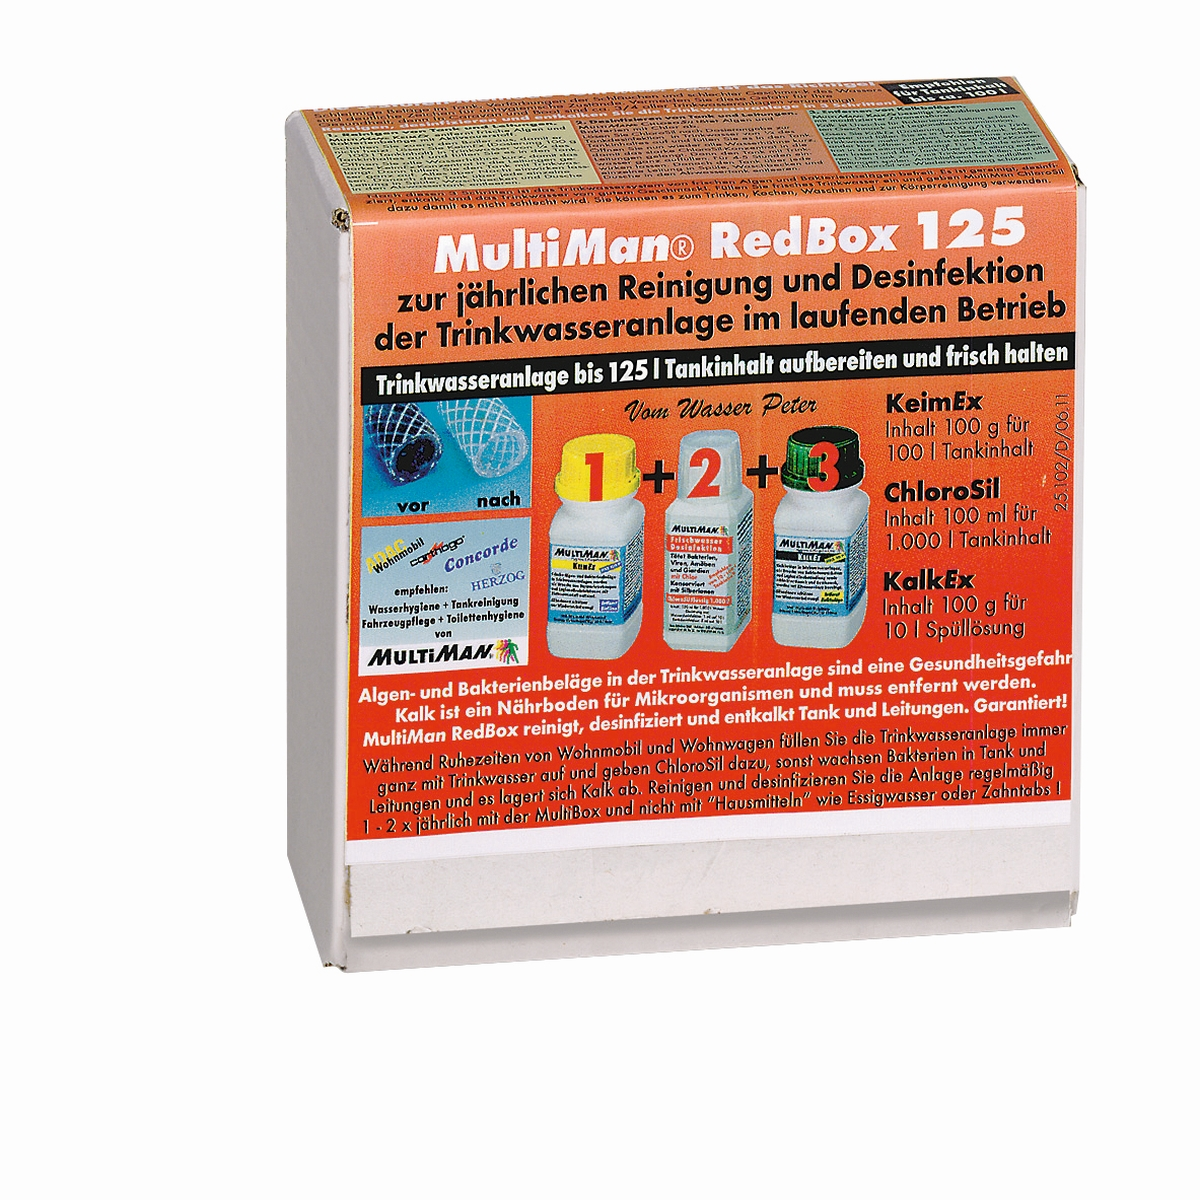 MultiMan RedBox 125